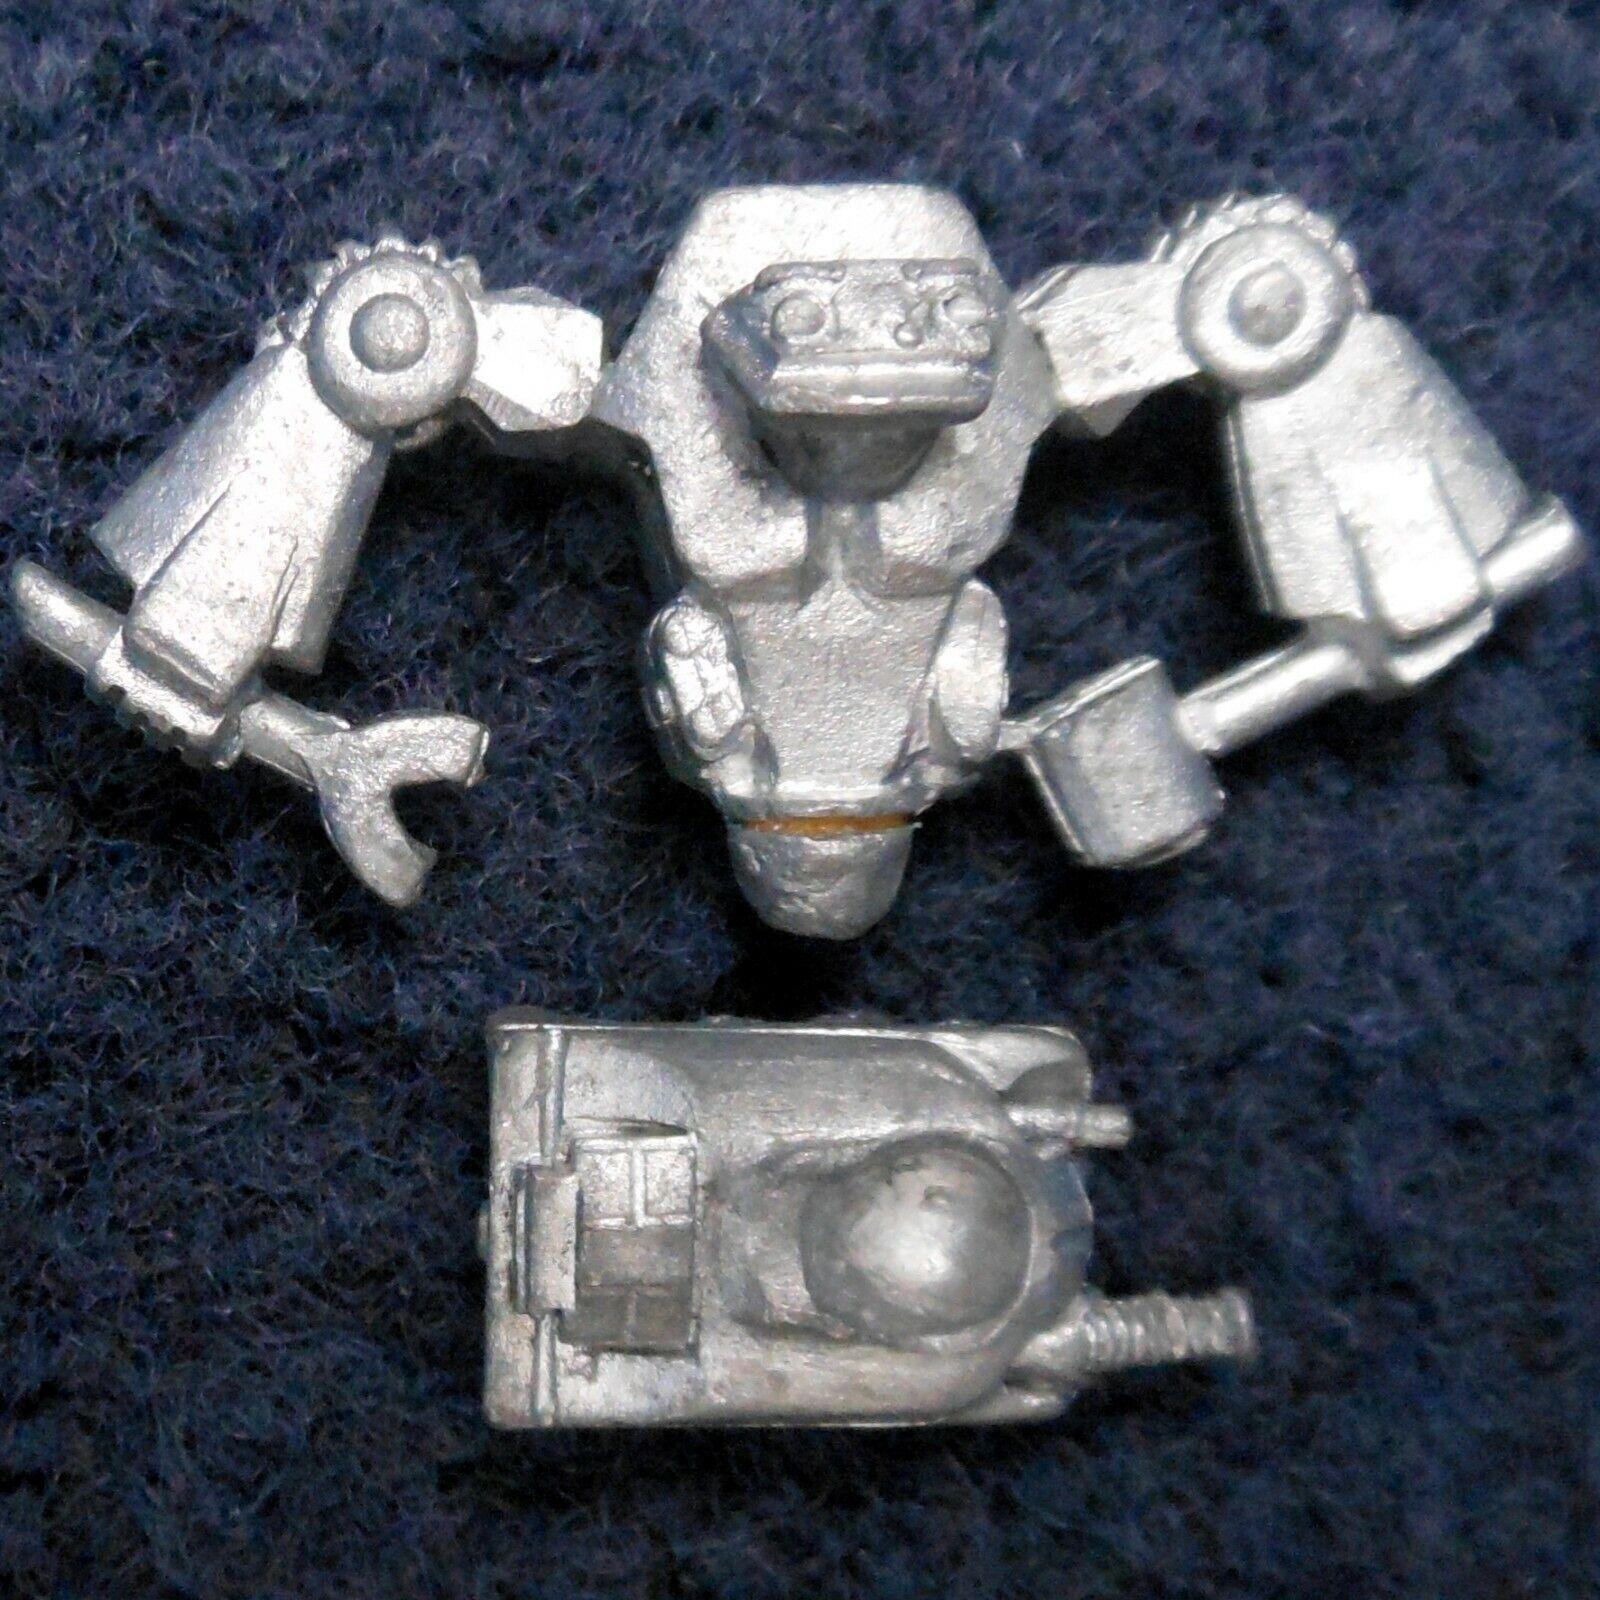 1987 PARA3 Paranoia Mechbot T Games Workshop Bot Droid Robot Troubleshooter GW